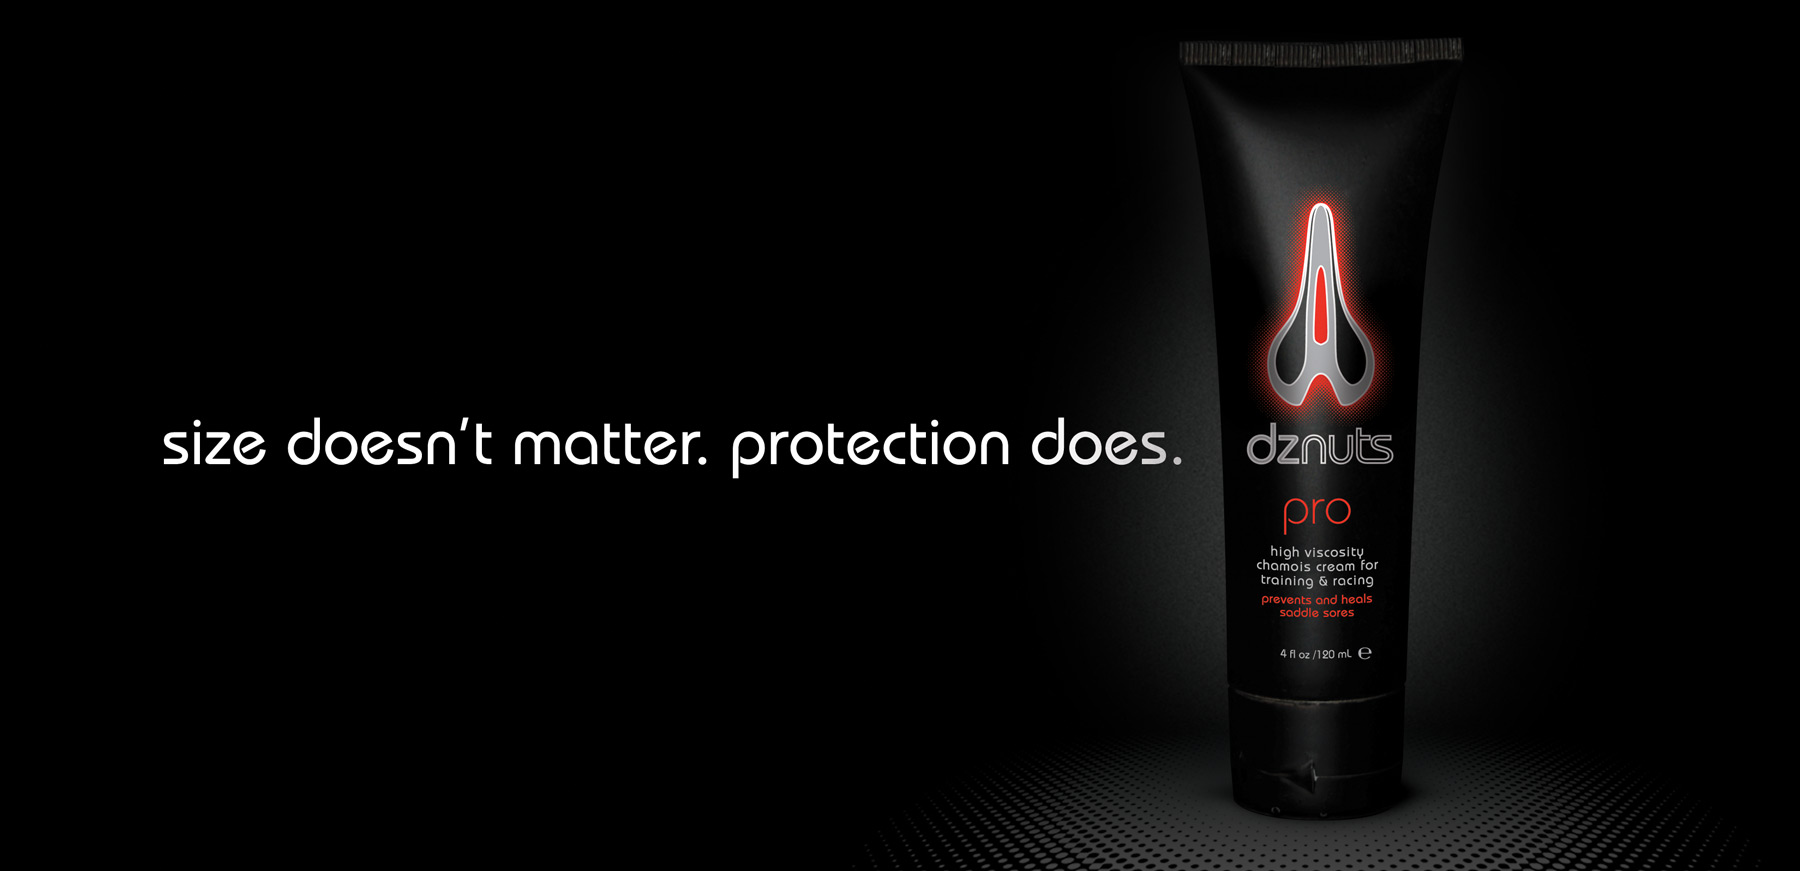 DZ Nuts pro product image